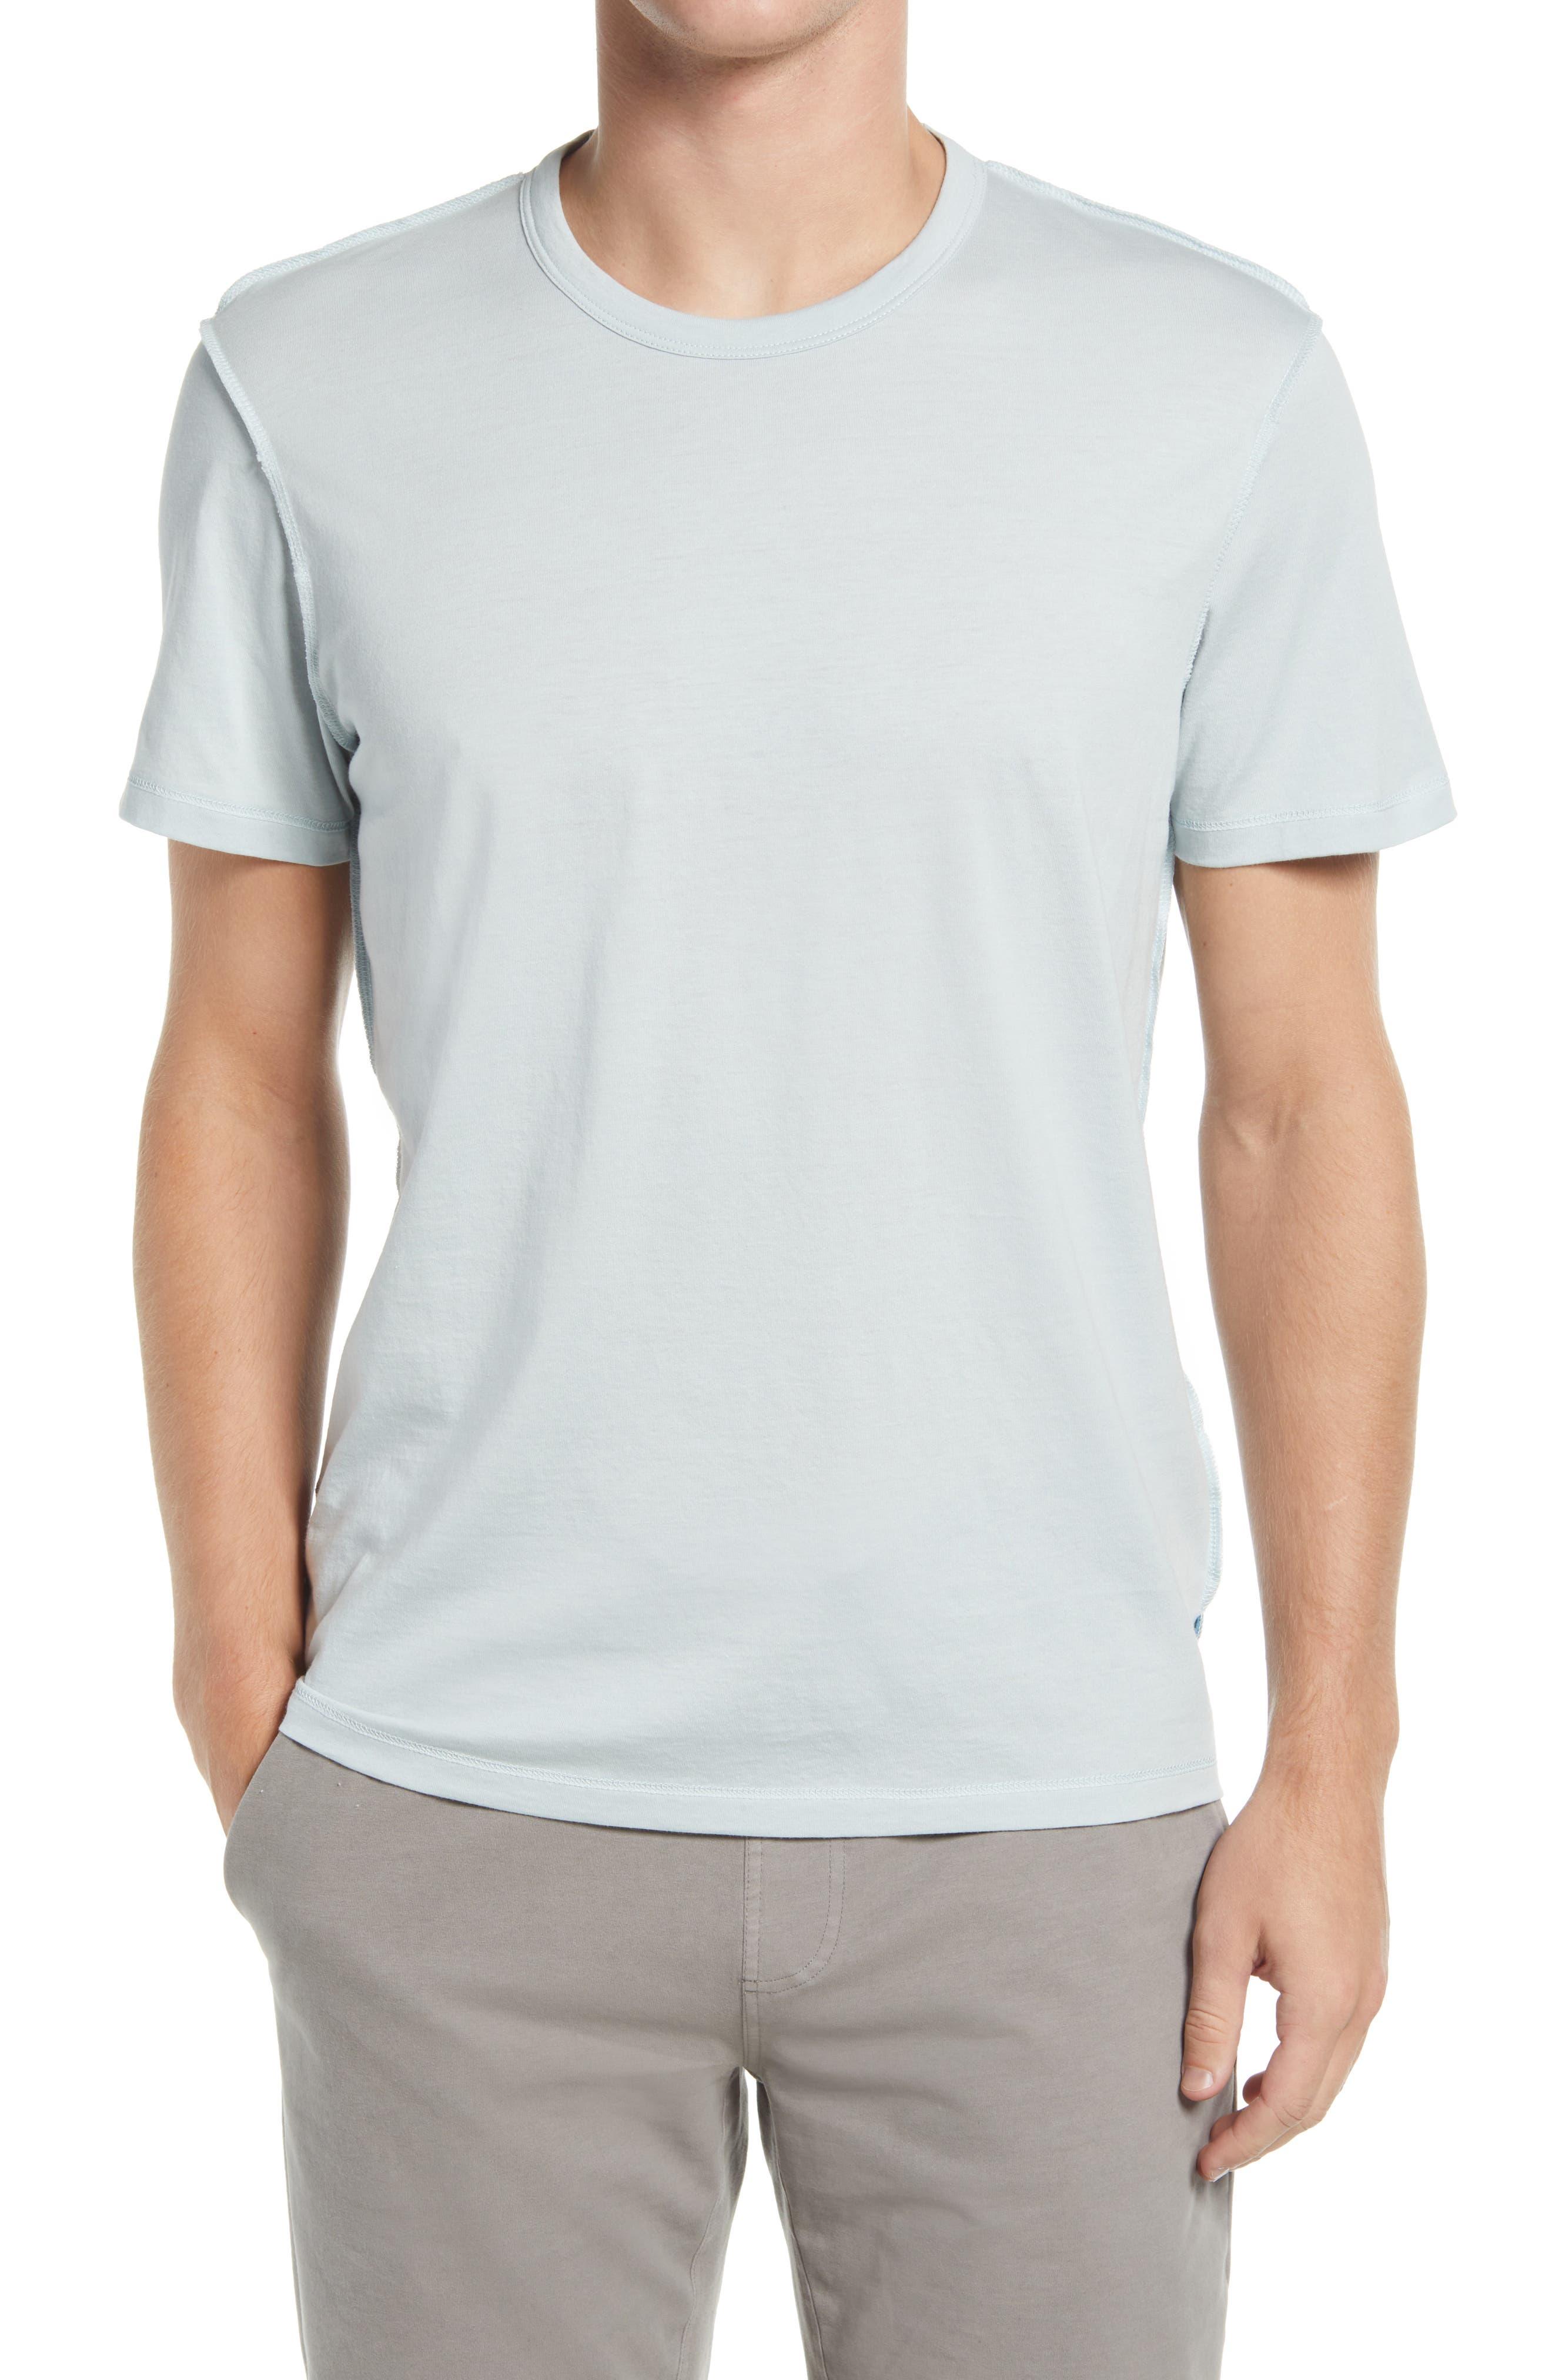 Jason Scott Reverse Seam Distressed Pima Cotton T-Shirt